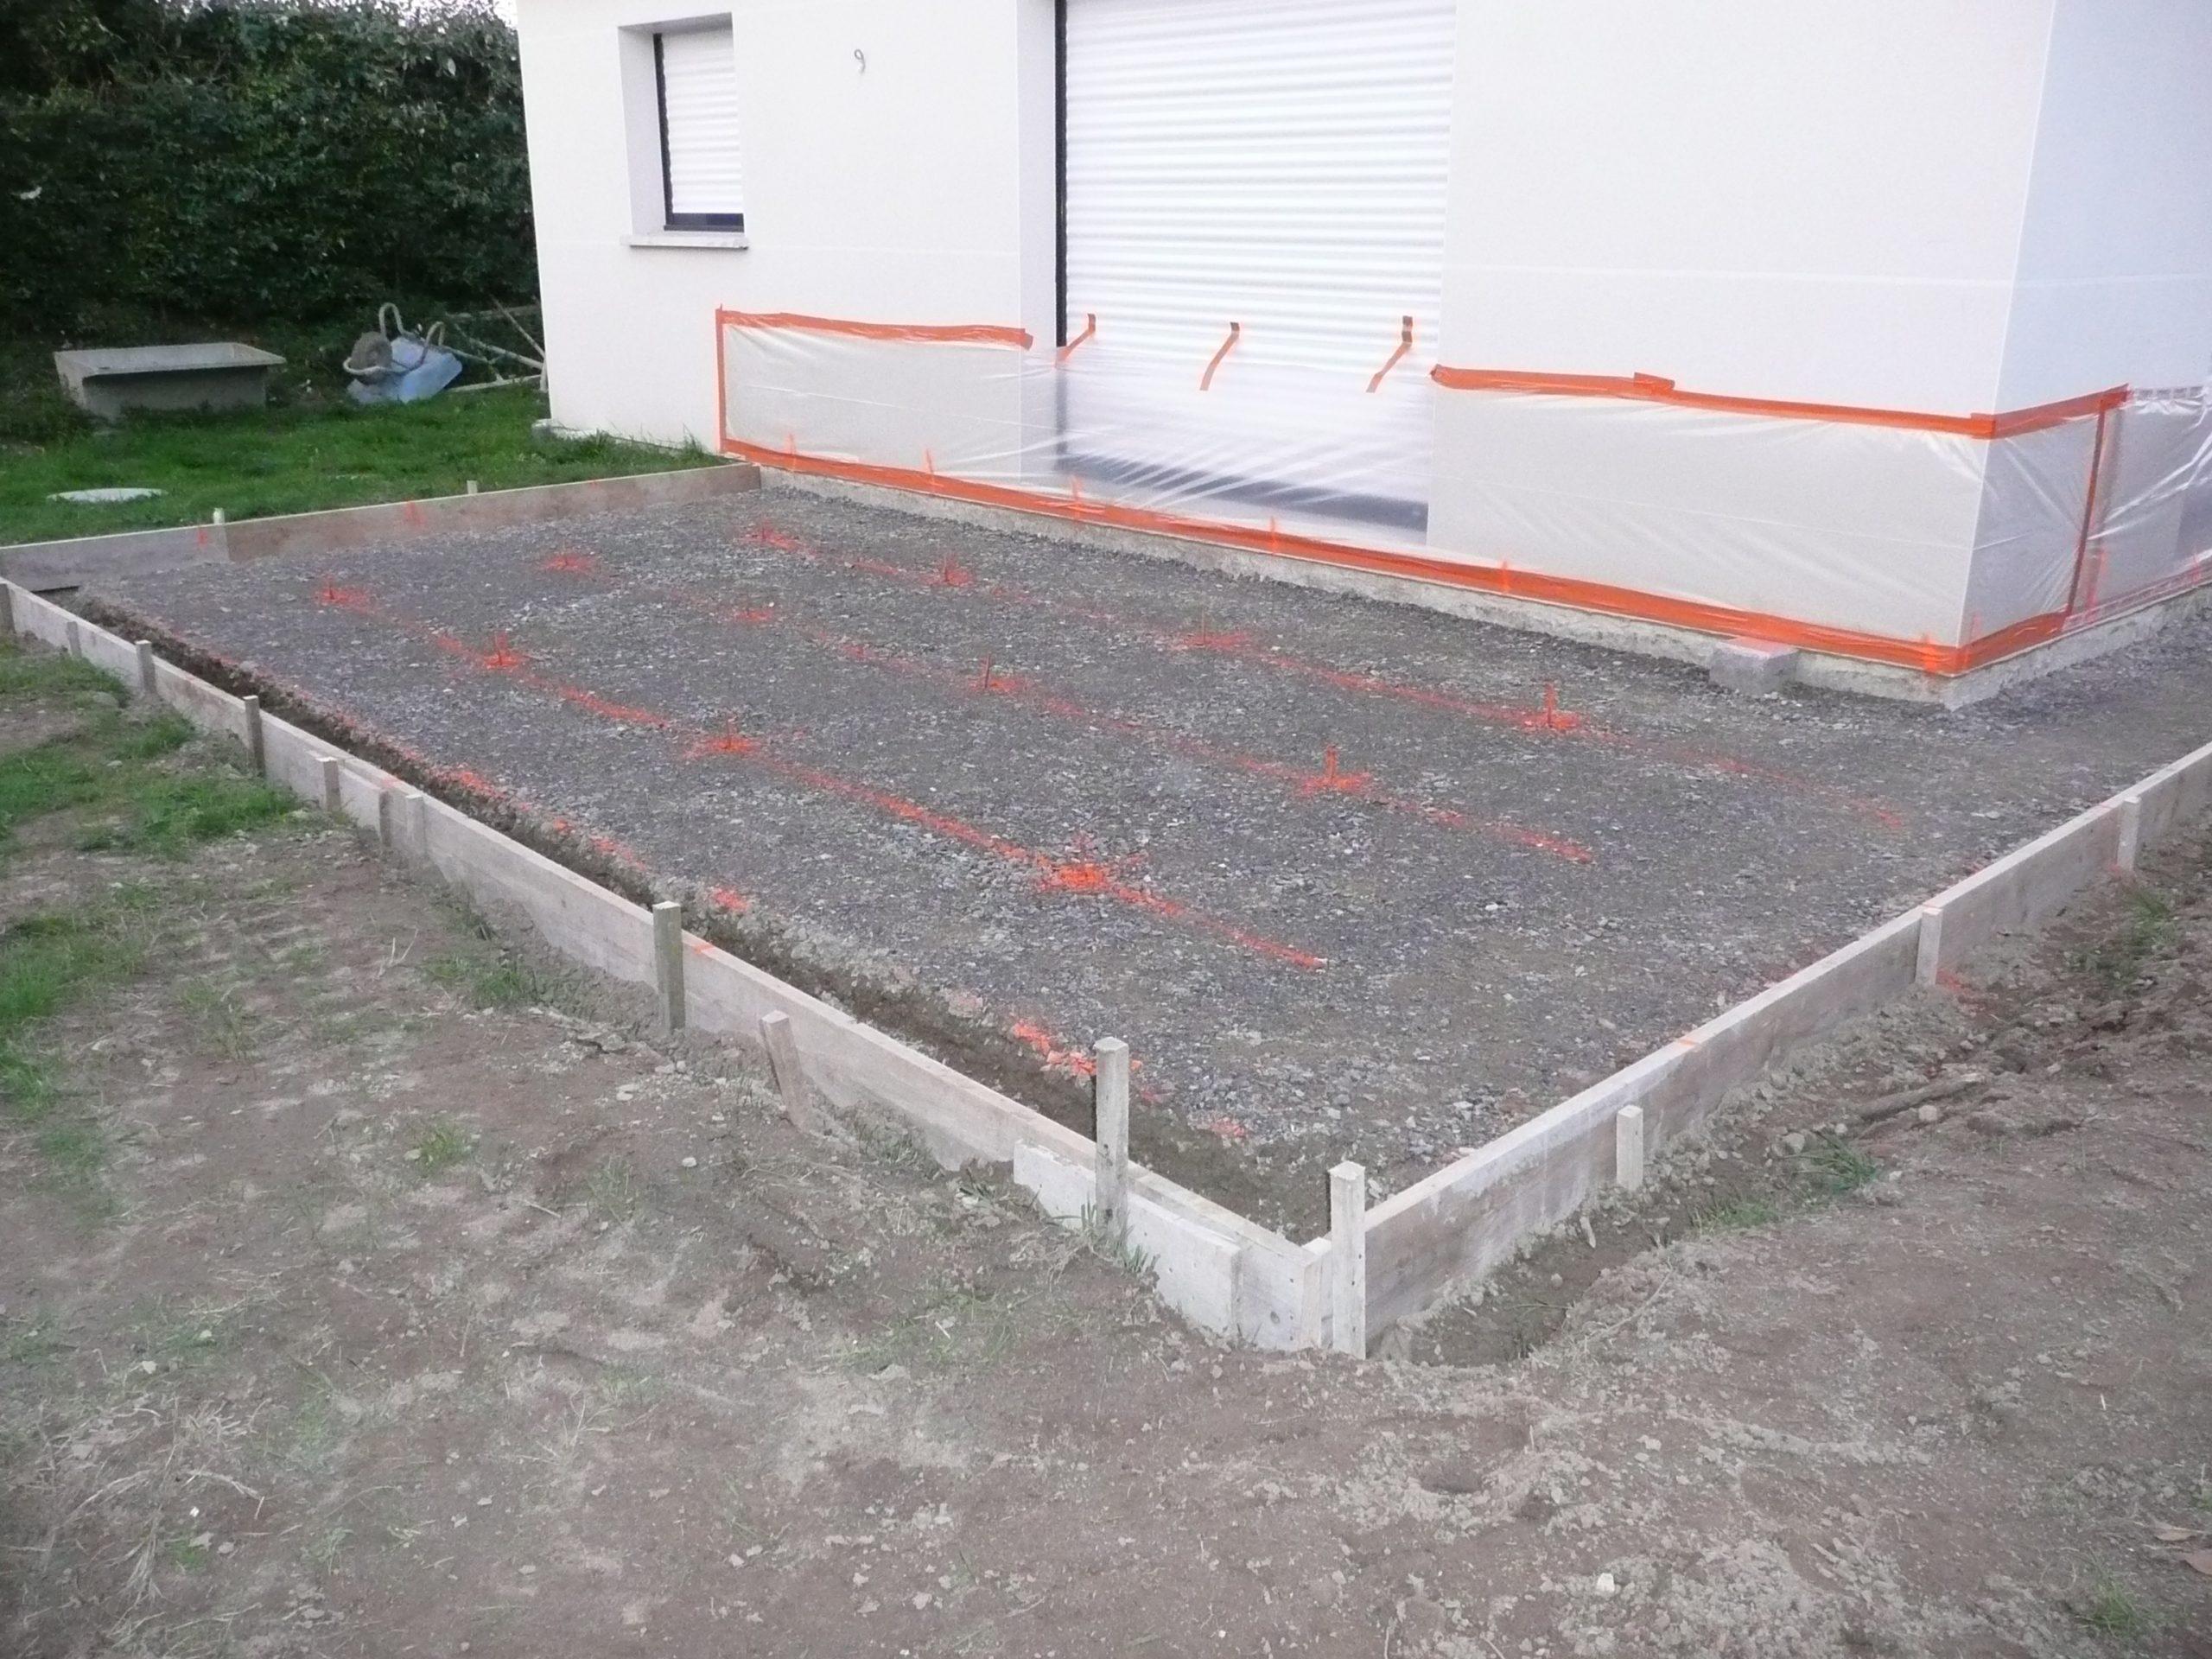 100+ [ Bordure Beton Castorama ] | Déco Pont Bois Jardin ... concernant Bordure De Jardin Castorama